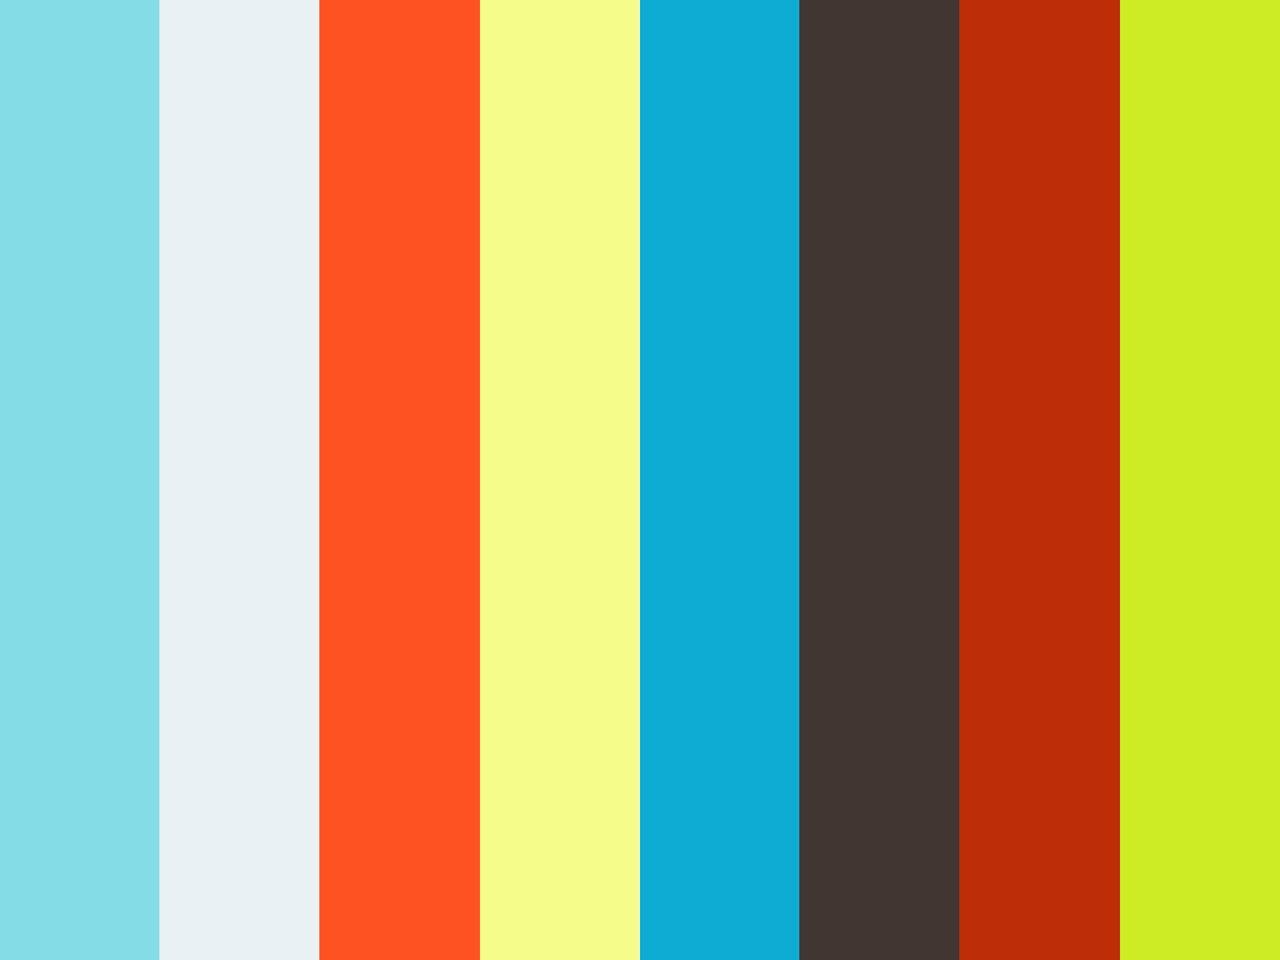 Colorist Showreel 2017 - Ola Bäccman